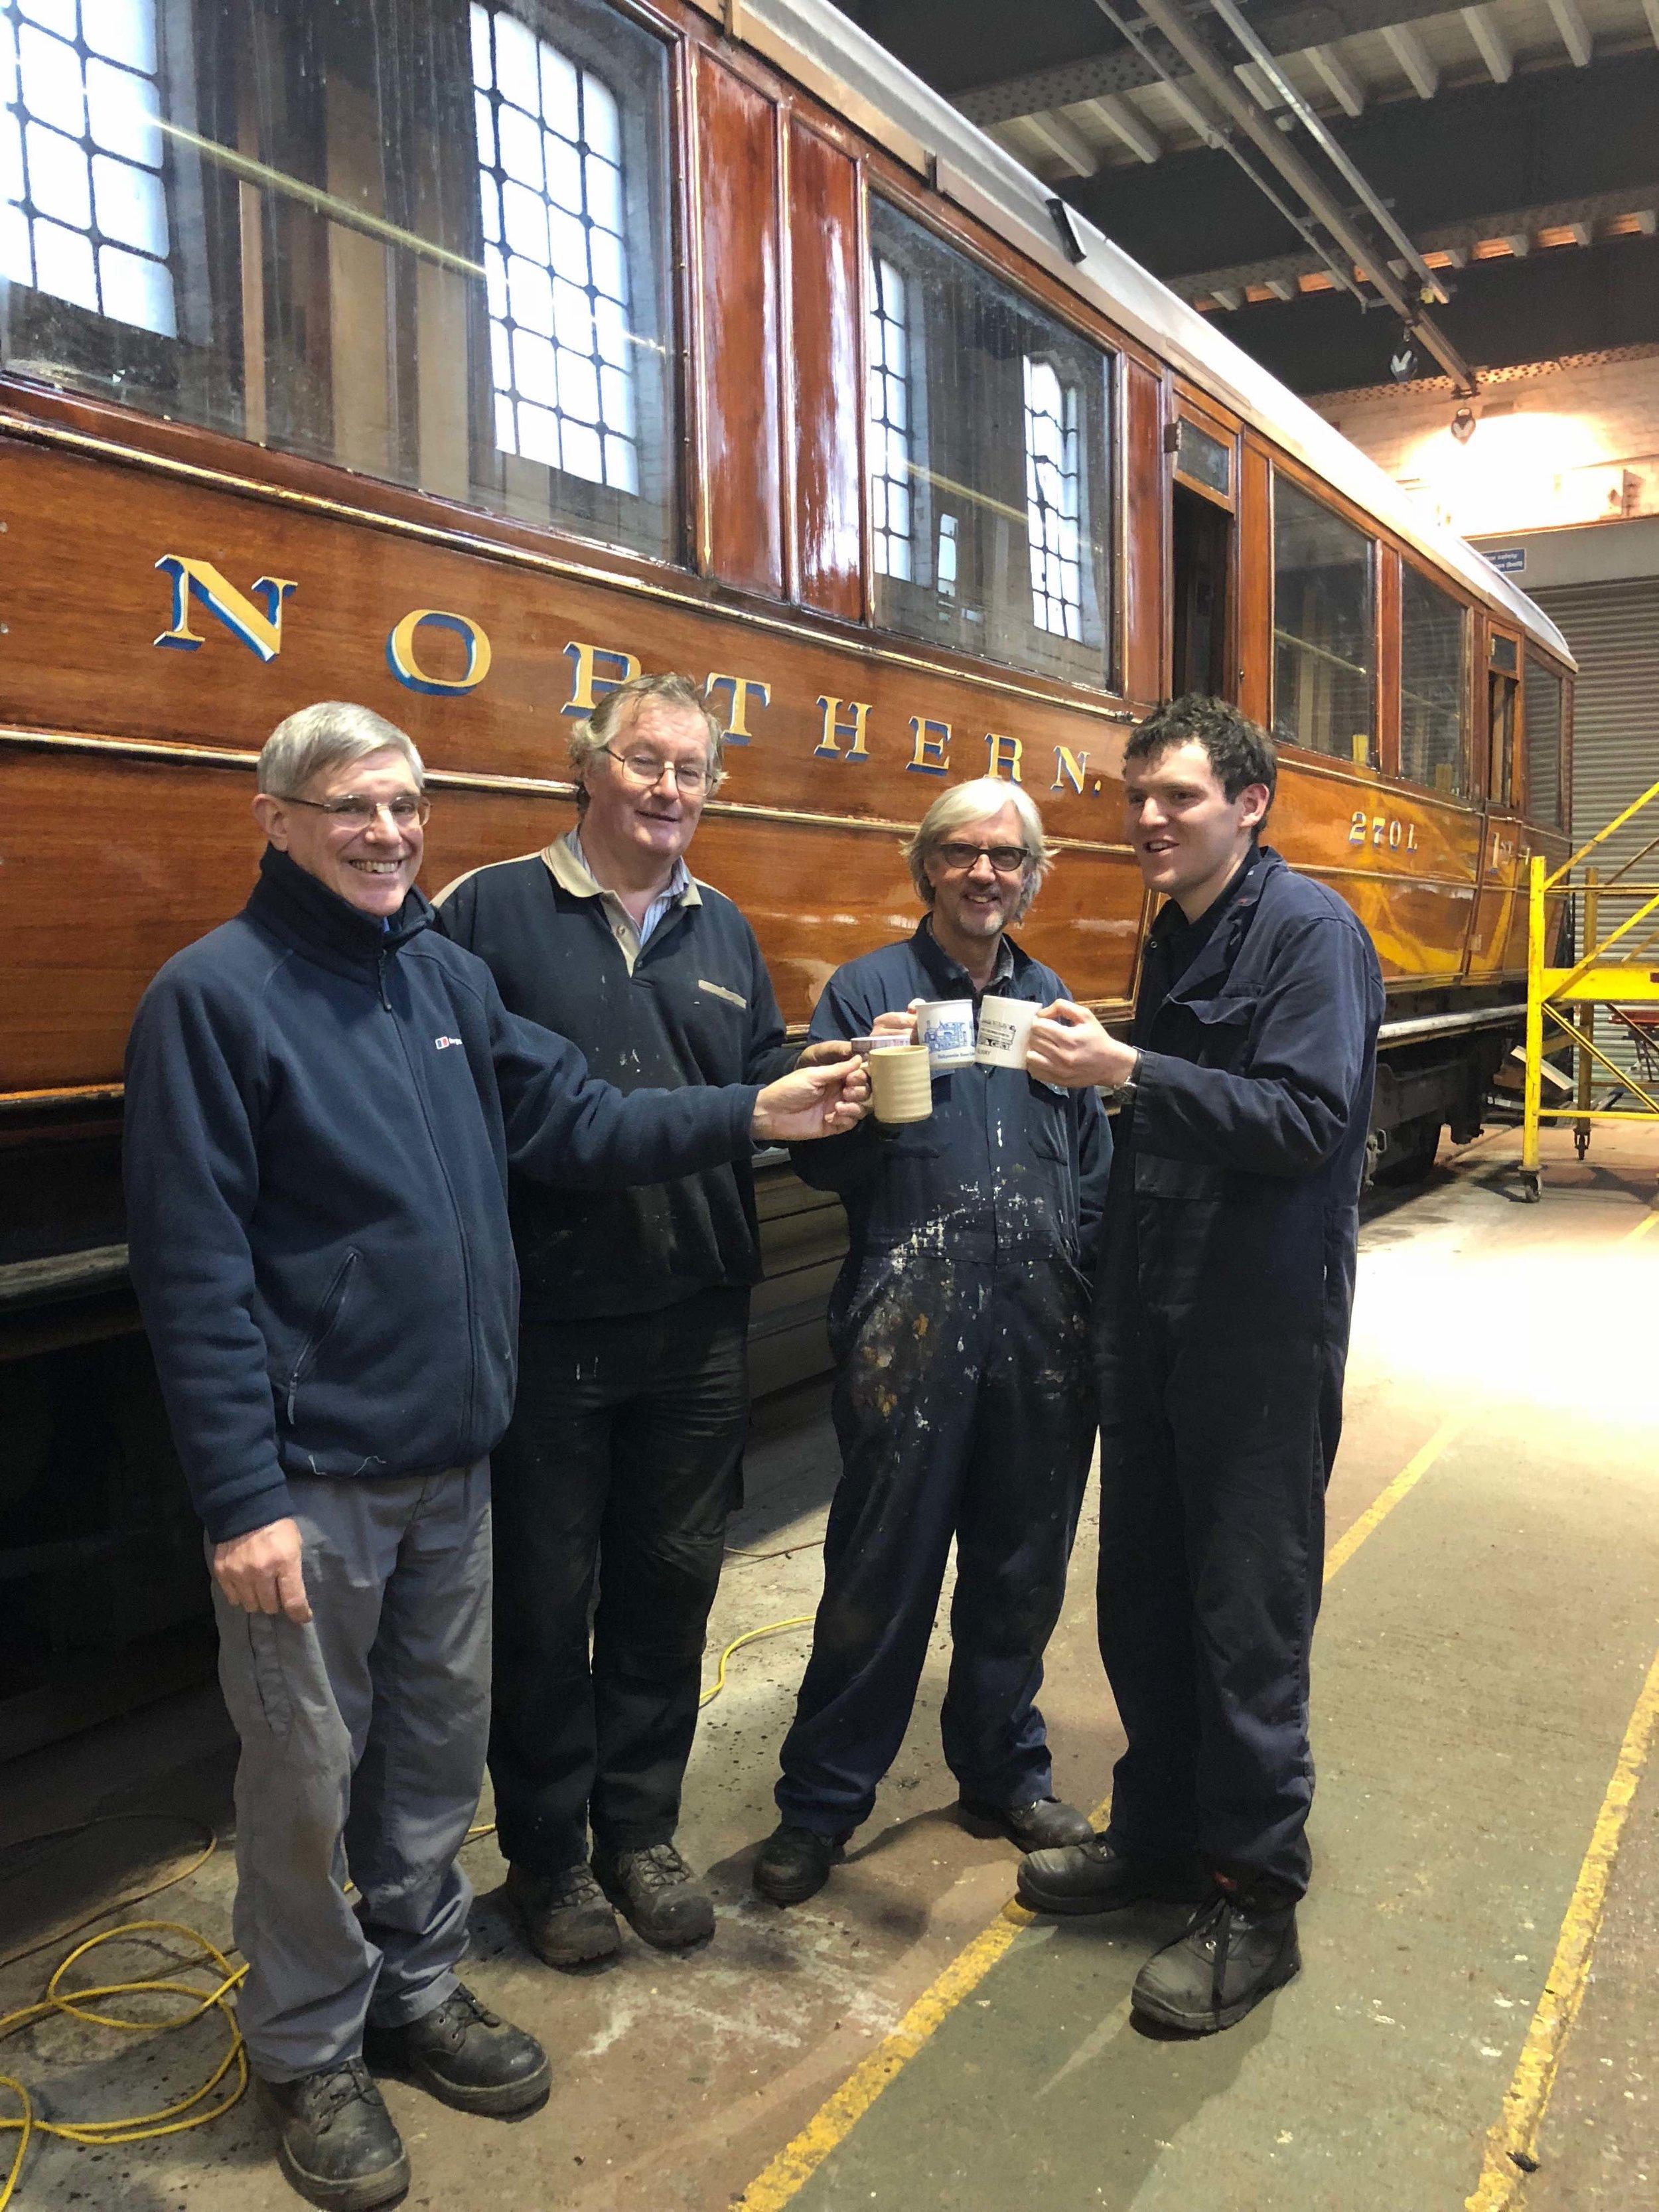 Derek Stagg, Hugh McQuade, John Beck and James Broughton celebrate the success of the £10,000 appeal during their tea break at the SVR's Kidderminster workshops. SVR